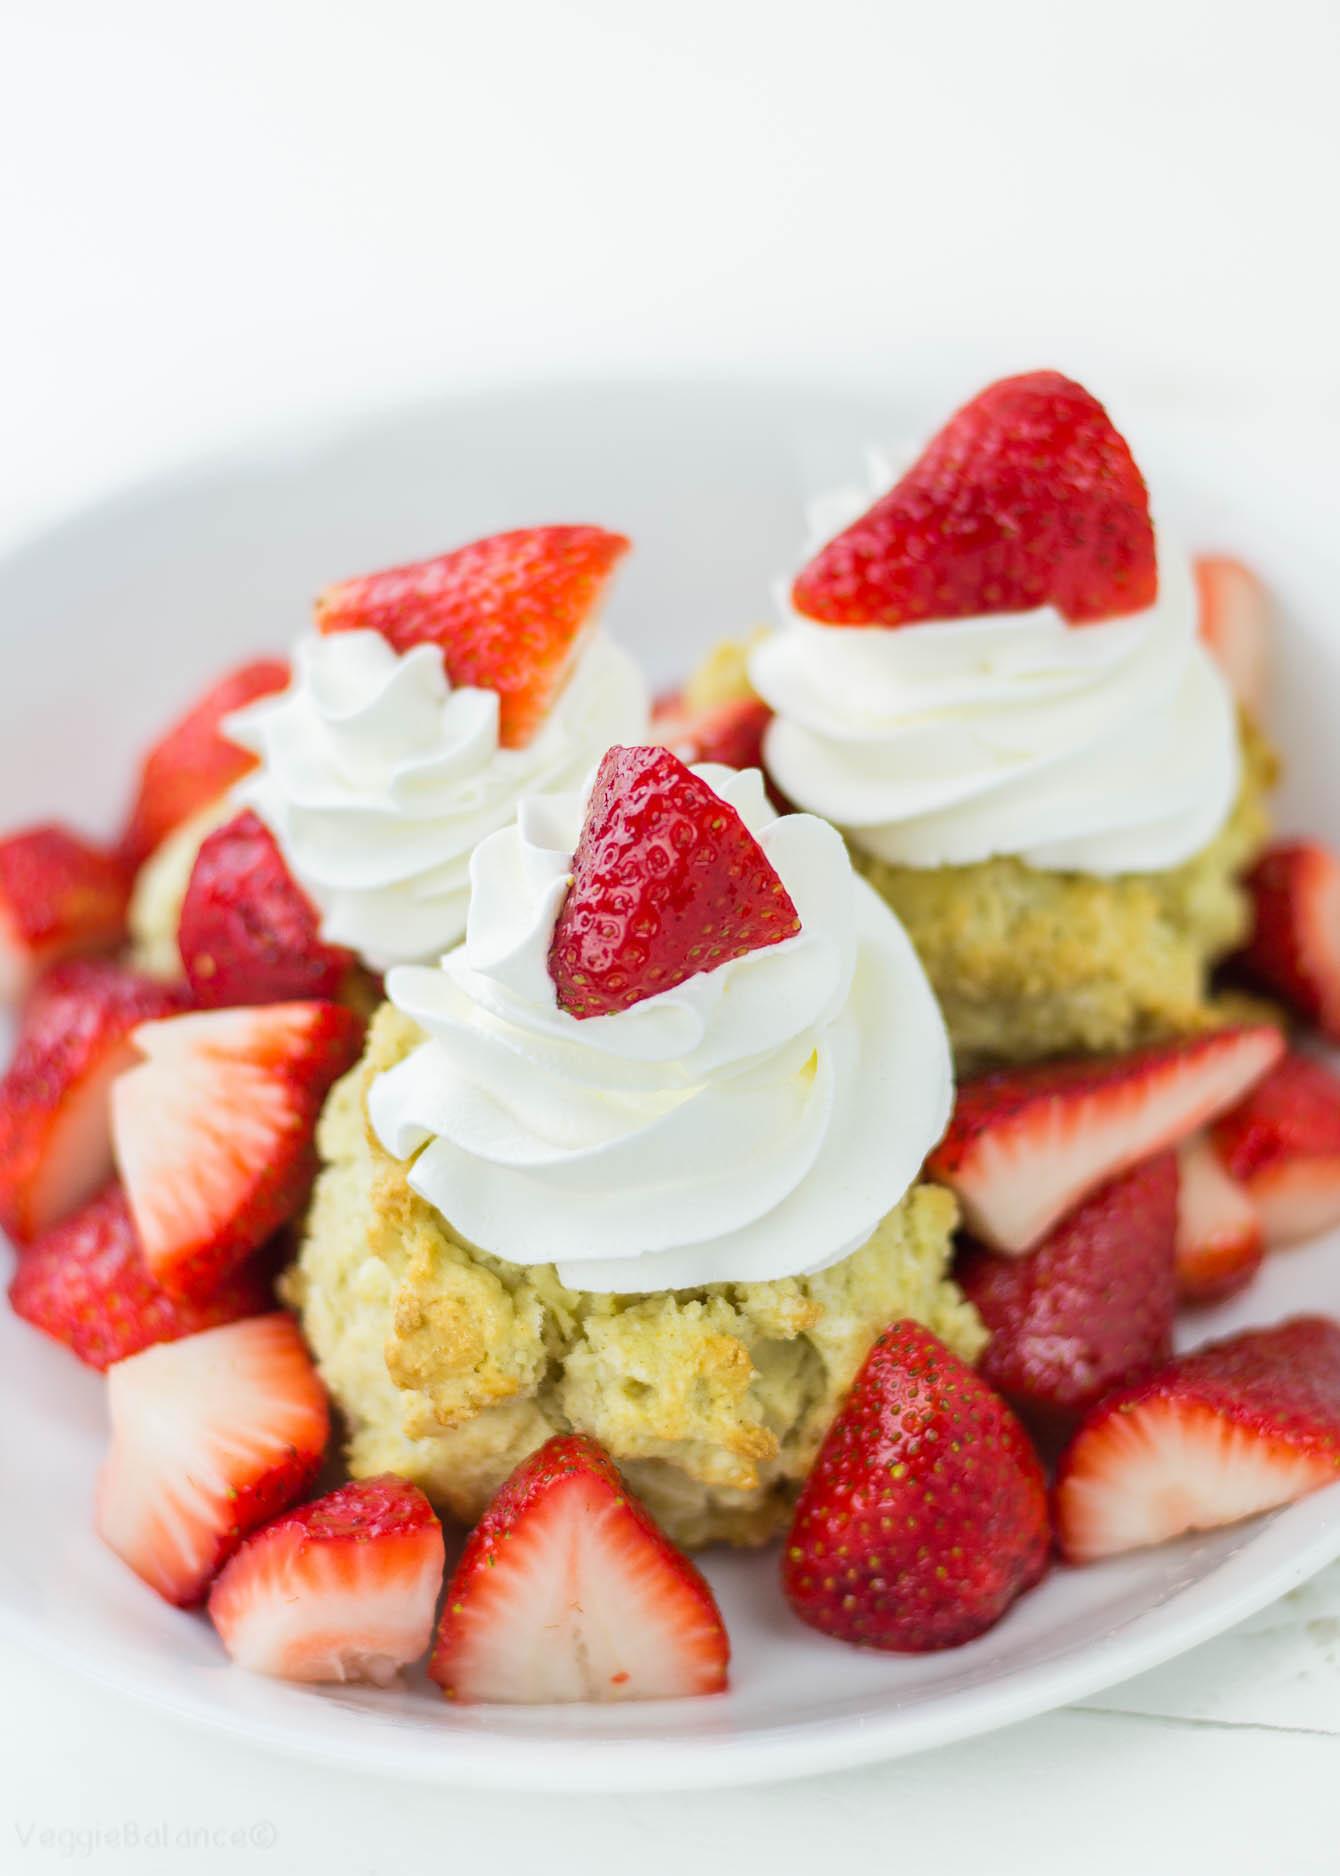 Gluten Free Dairy Free Strawberry Shortcake  Gluten Free Strawberry Shortcake Cookbook Release